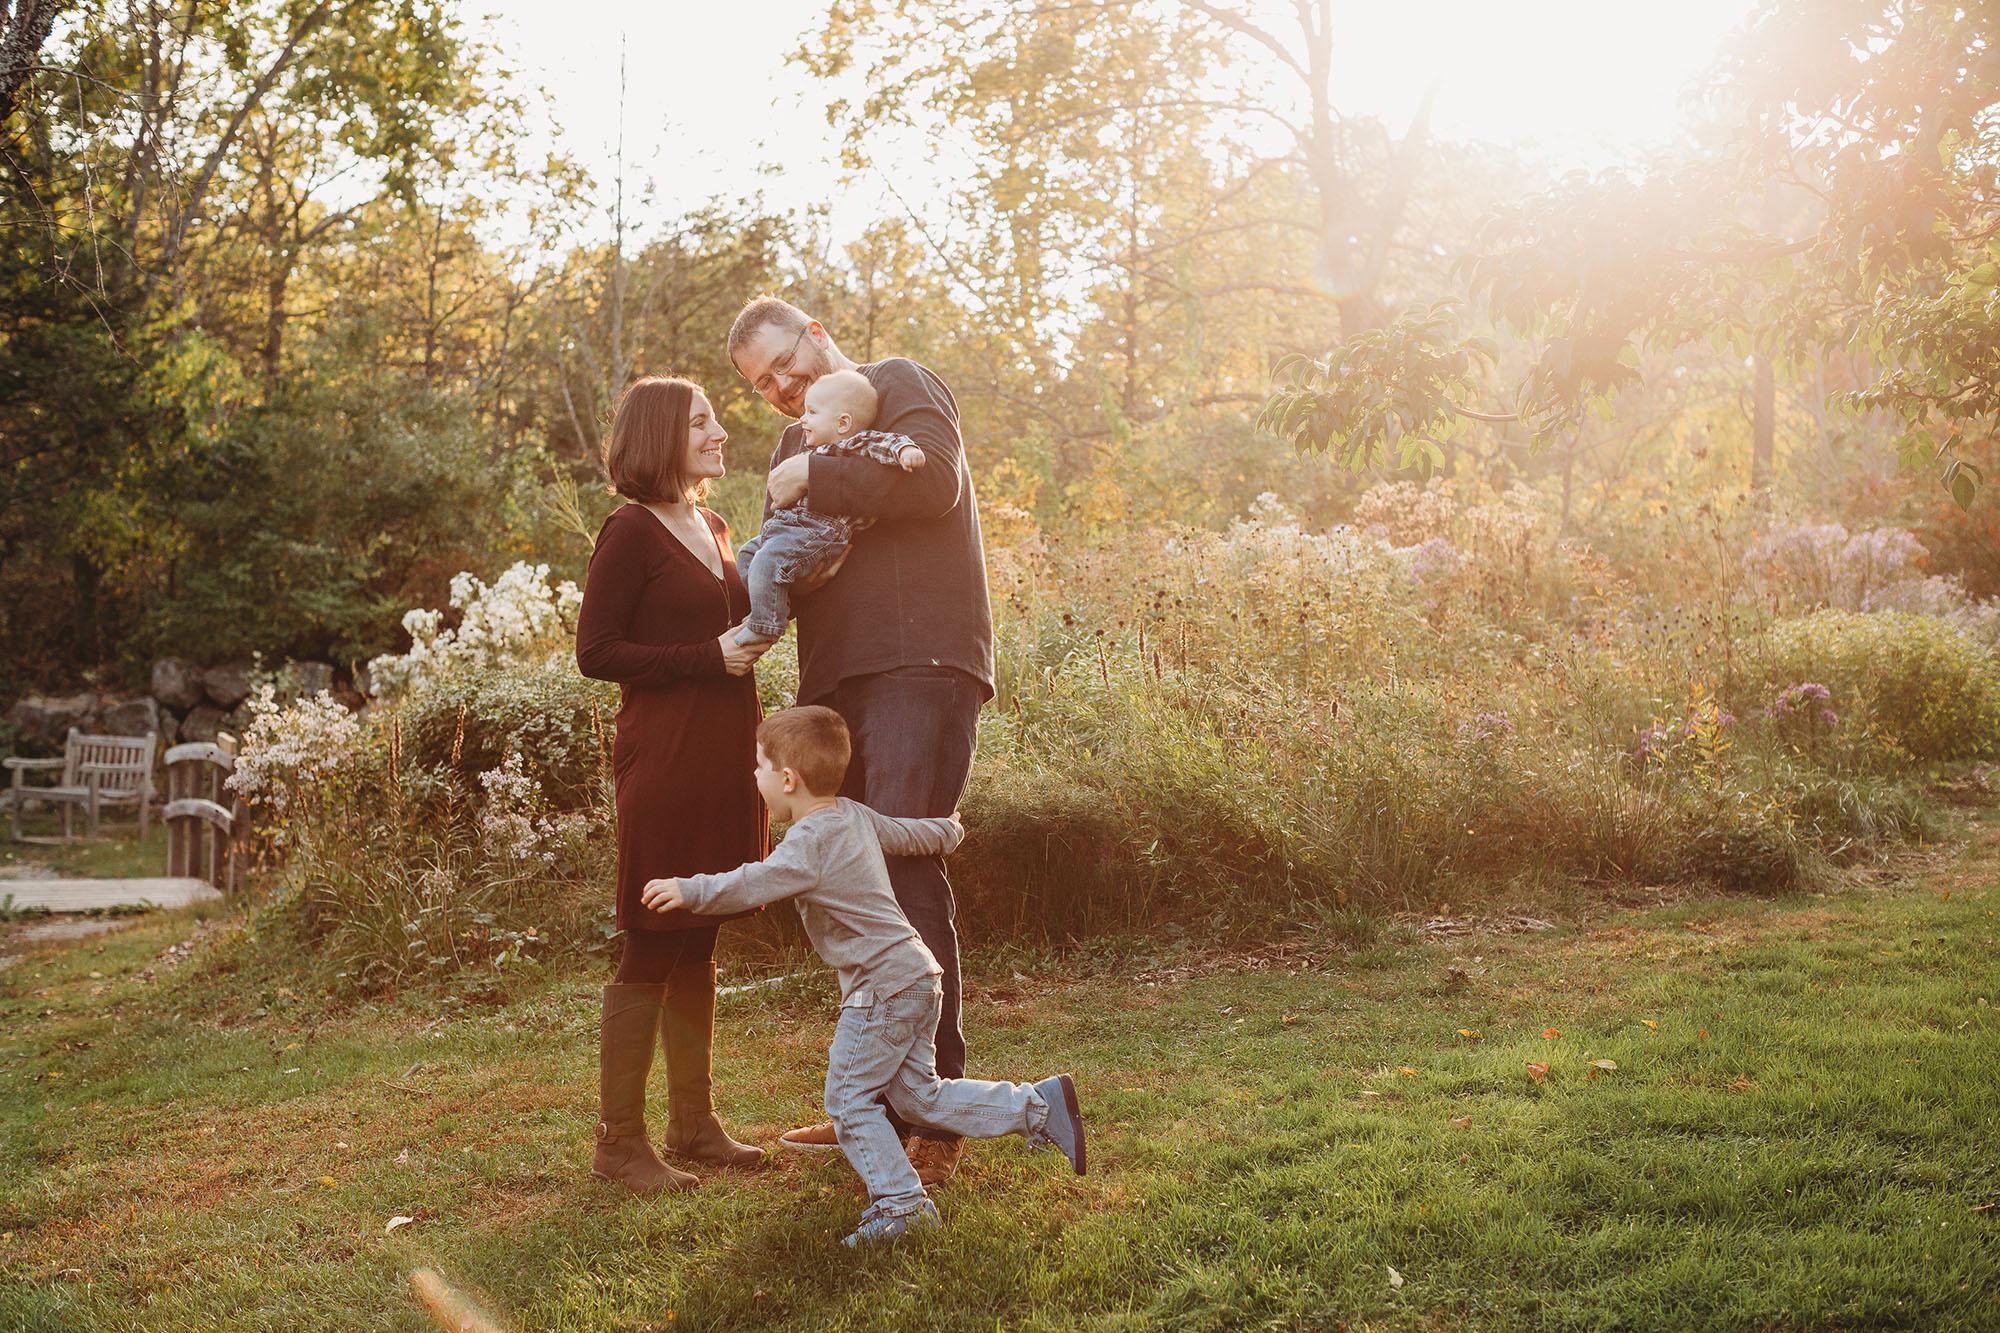 what-to-wear-faq-boston-family-photographer-joy-leduc.jpg